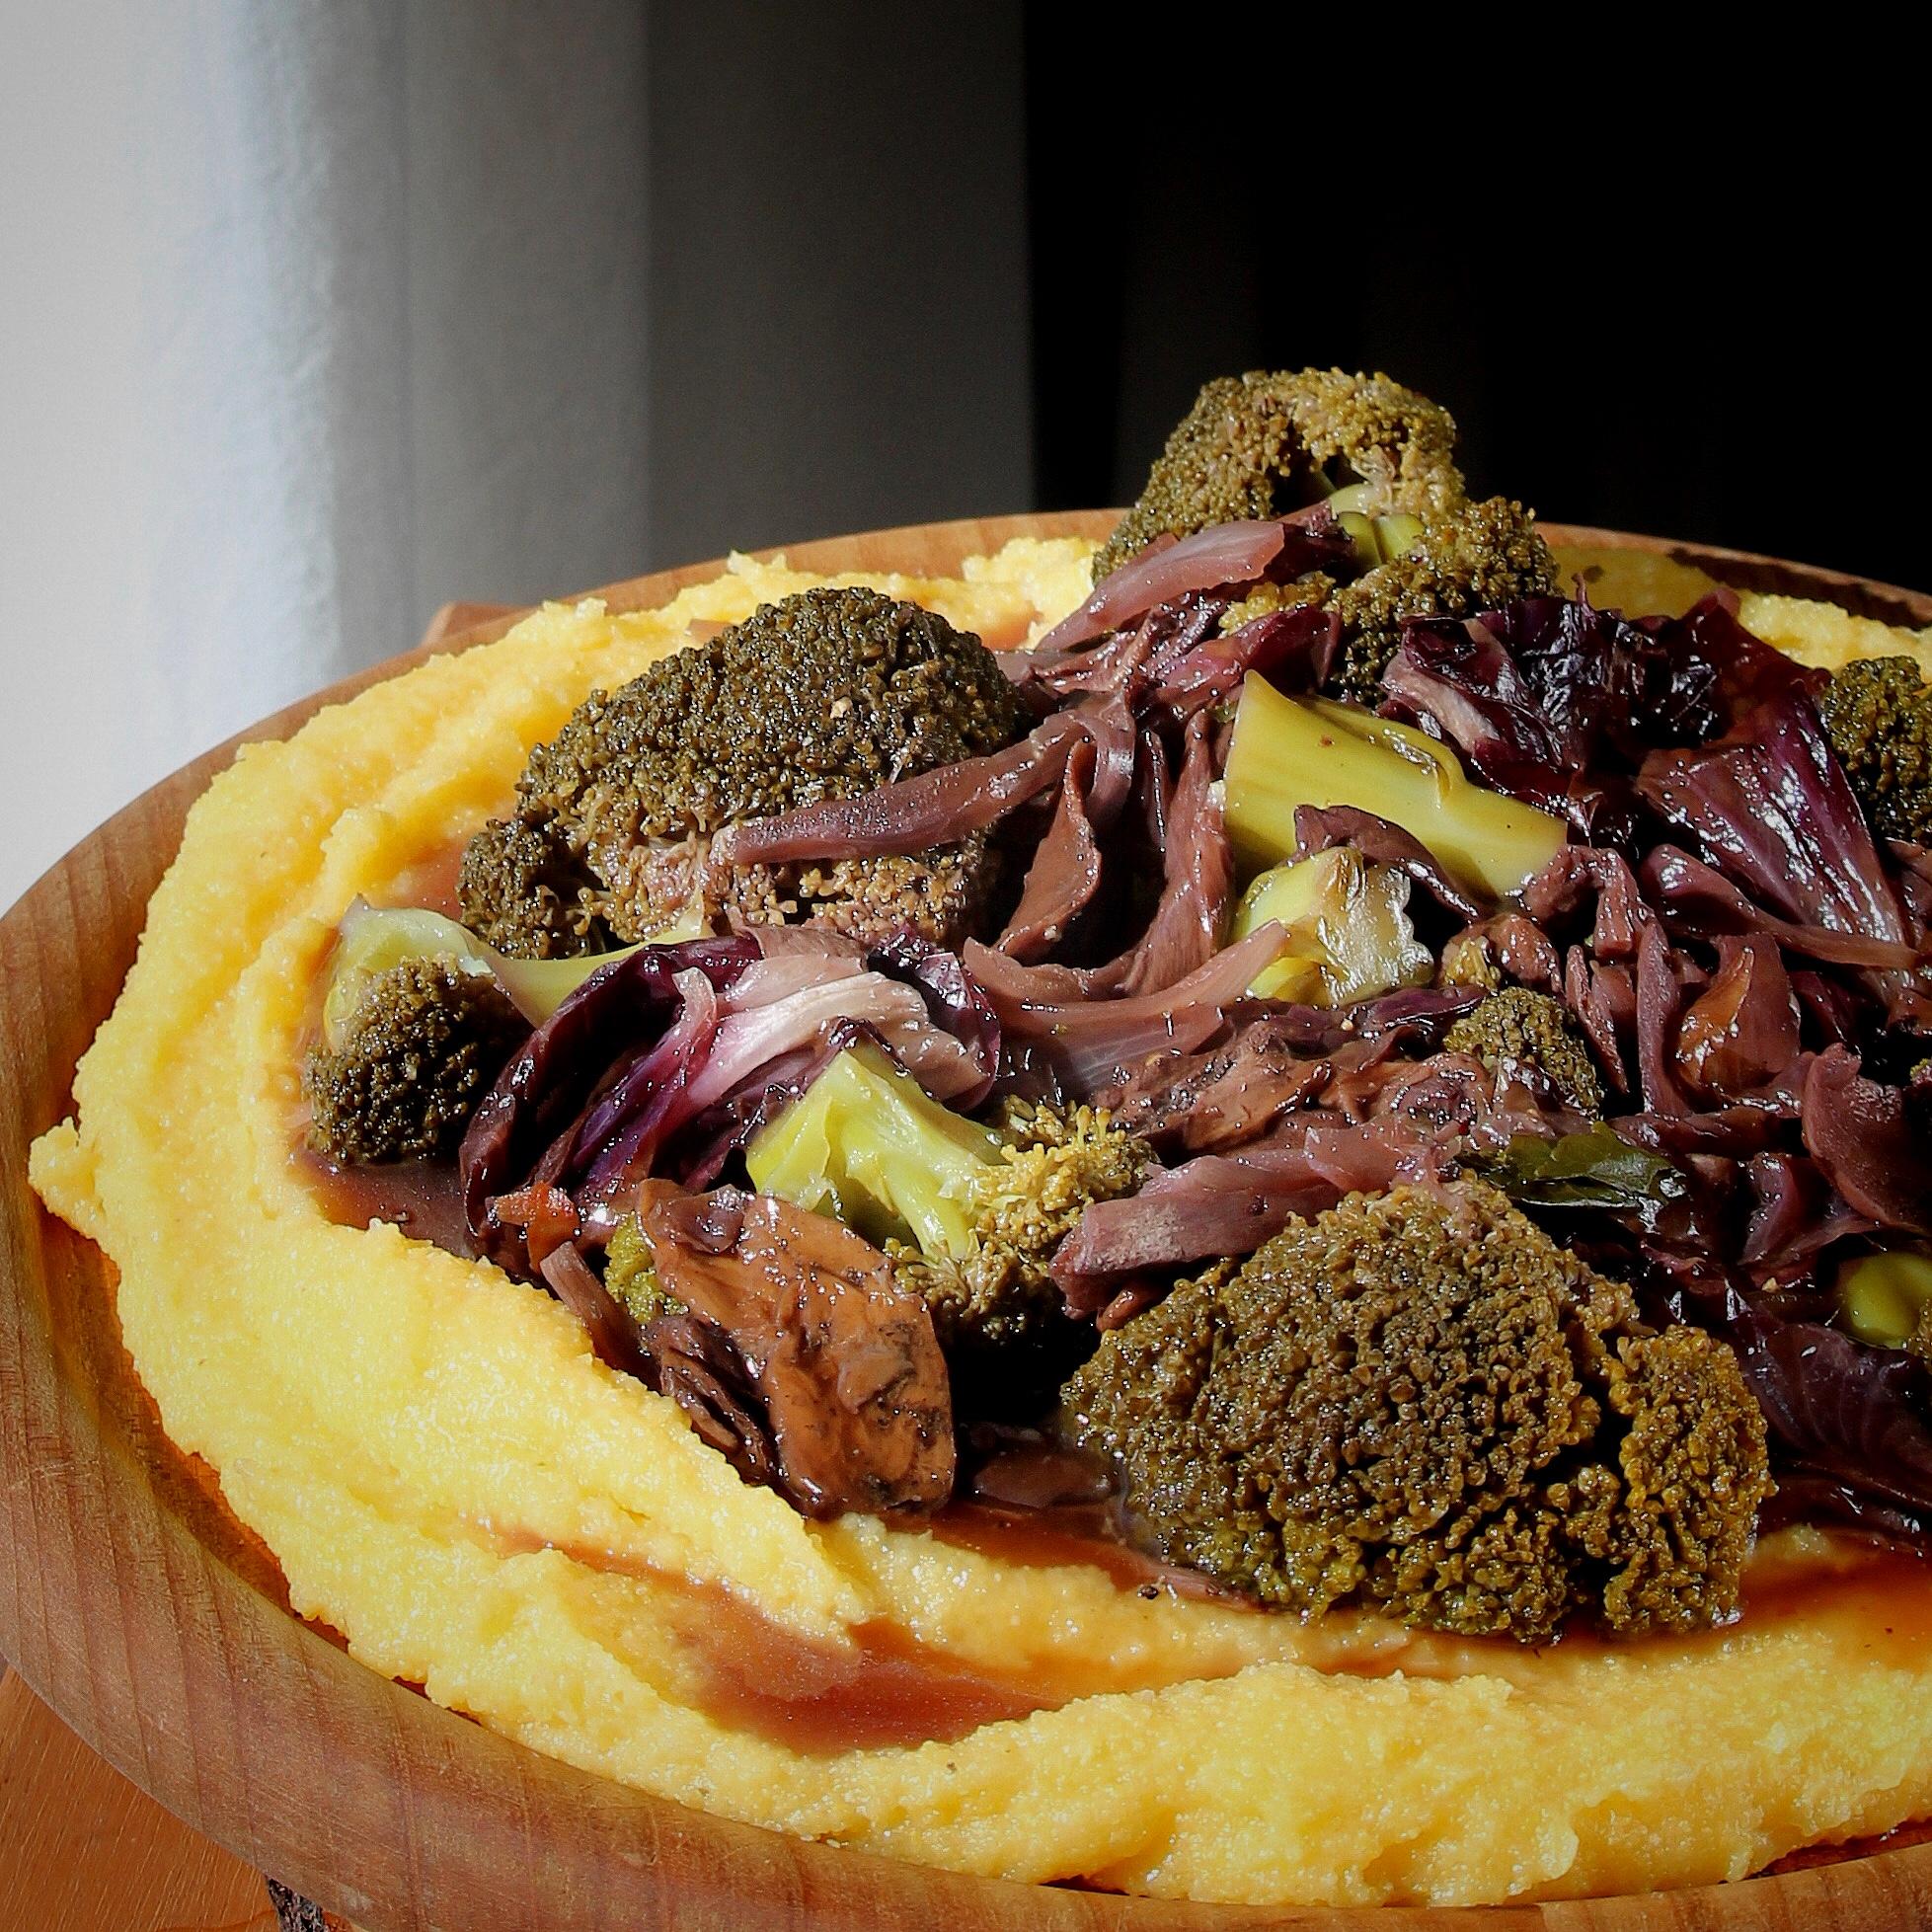 Braised Broccoli and Porcini with Polenta